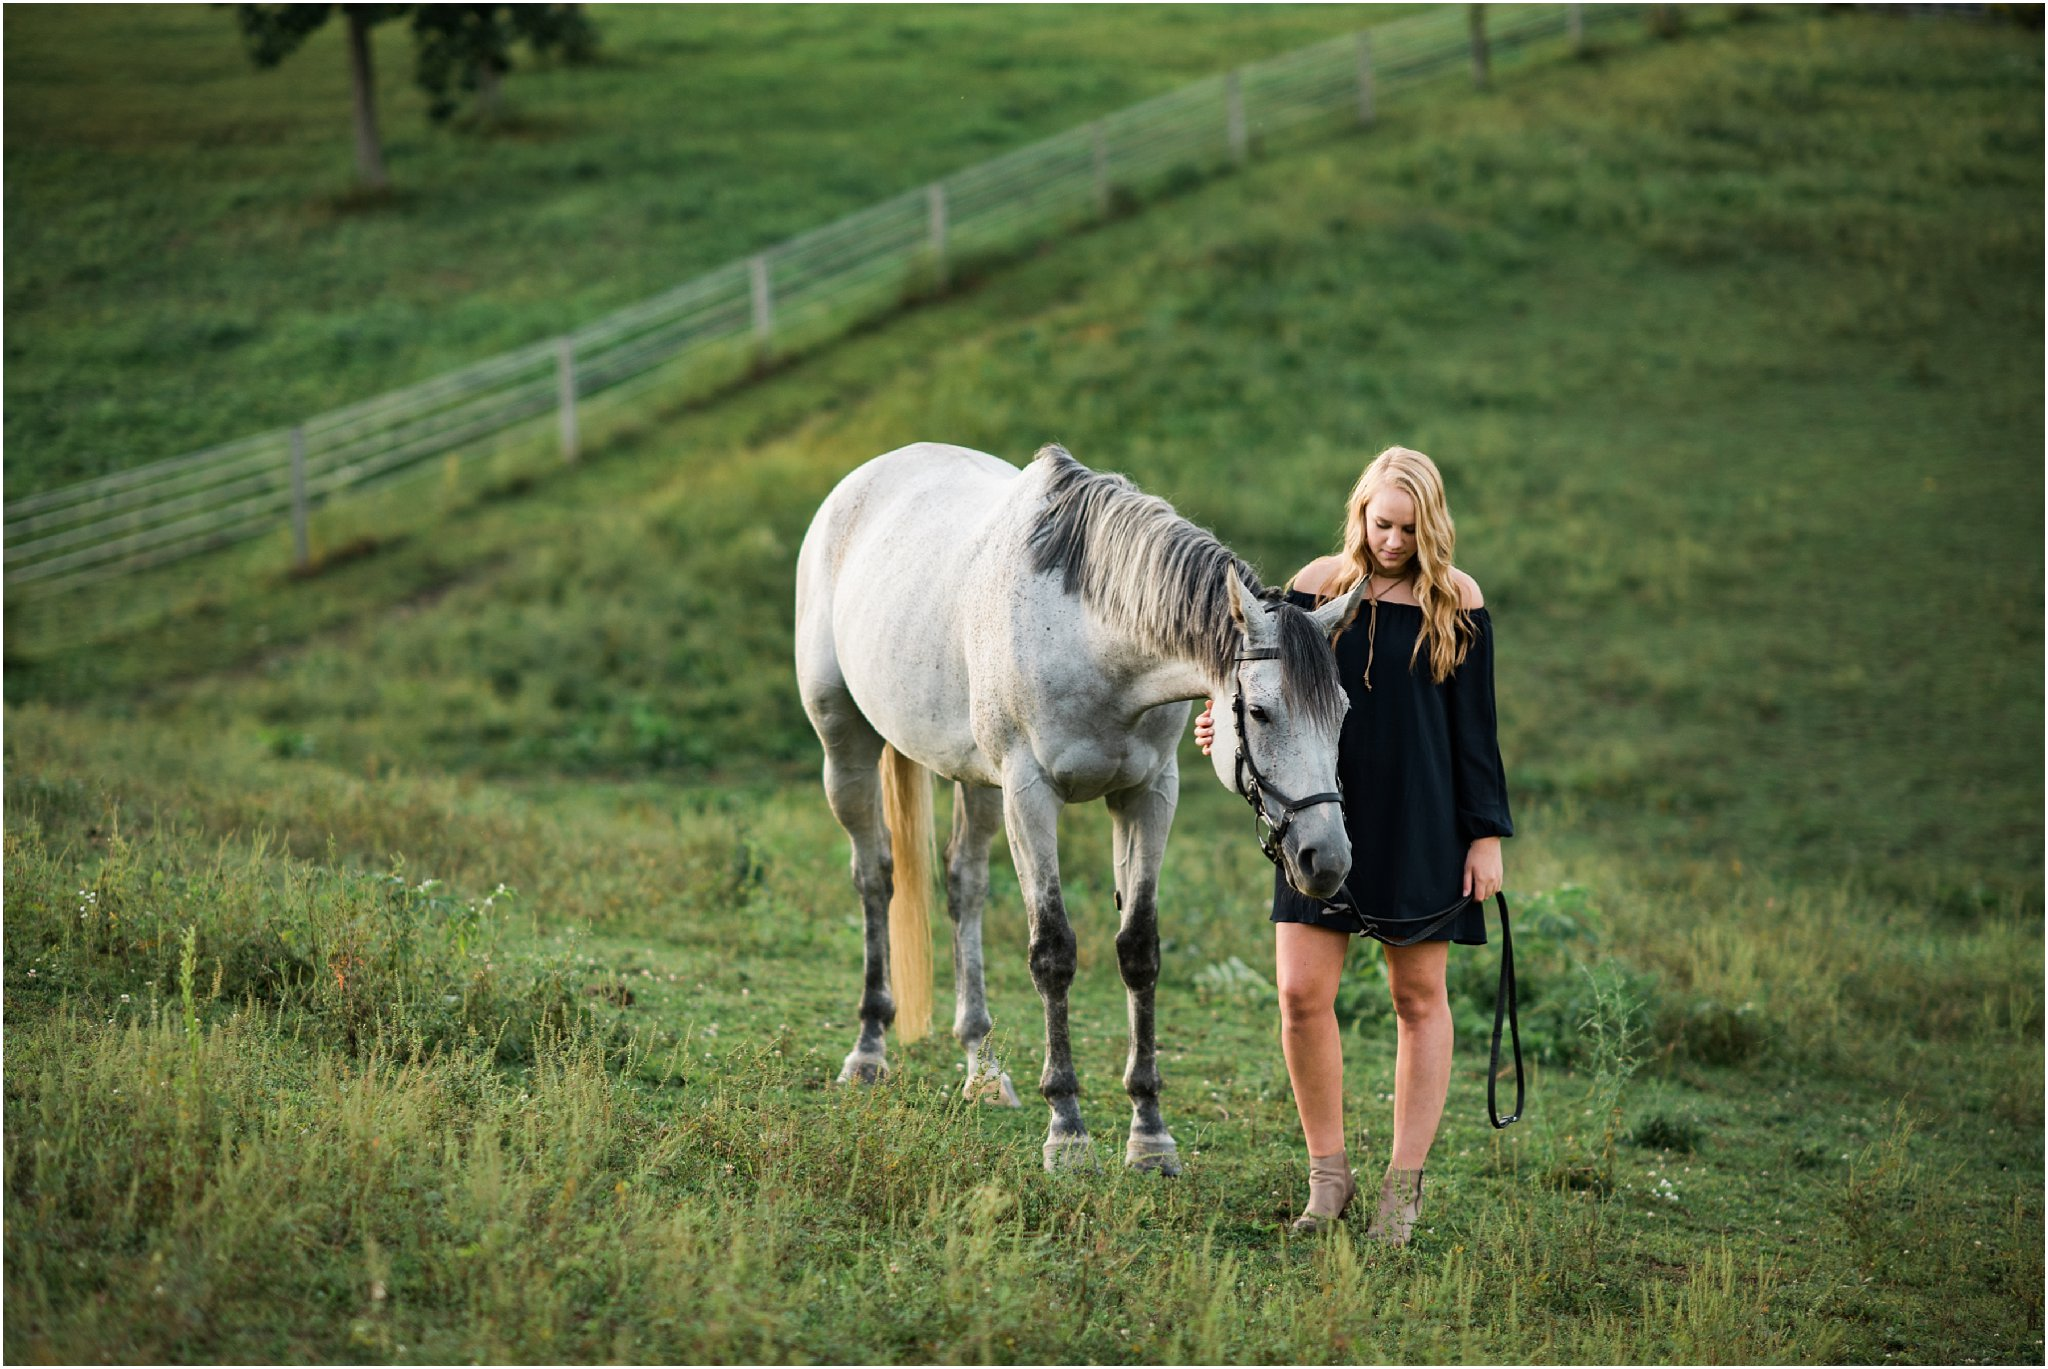 Pittsburgh Rachel Rossetti Senior Portrait Photography_0258.jpg